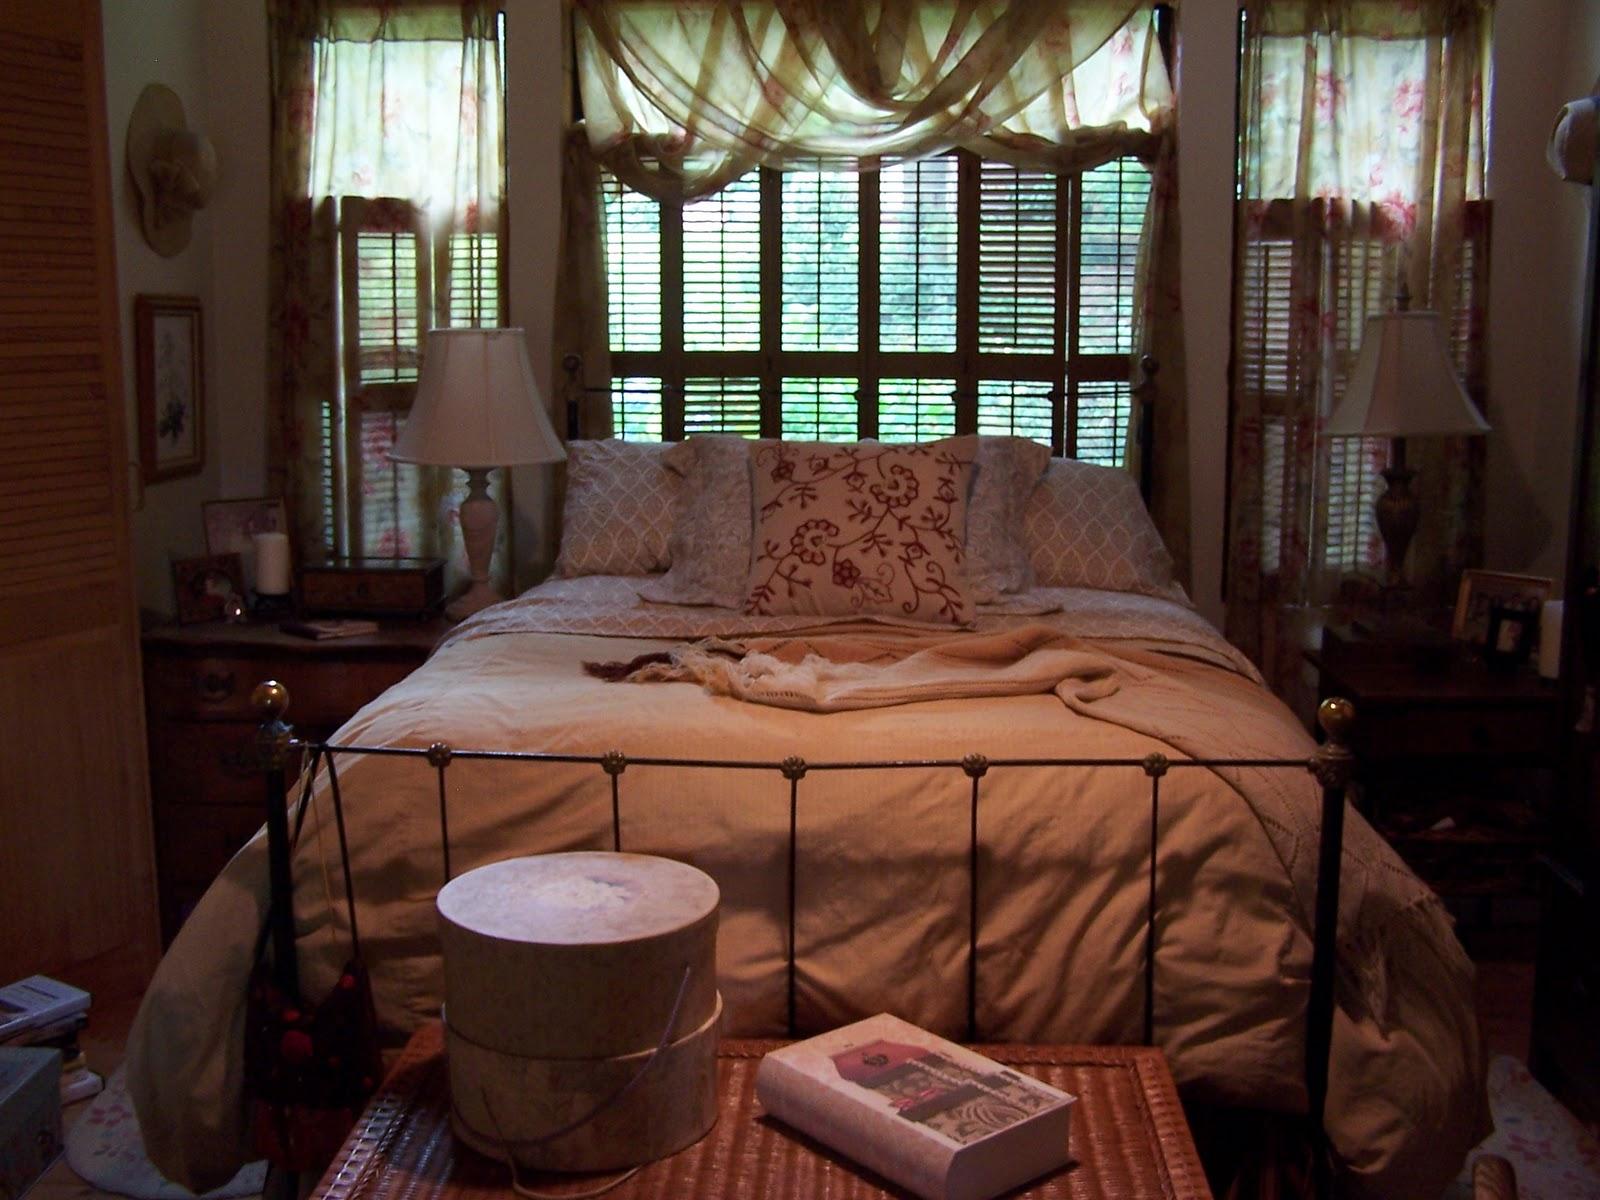 Beatrice Euphemie Bedroom Decorating For Fall